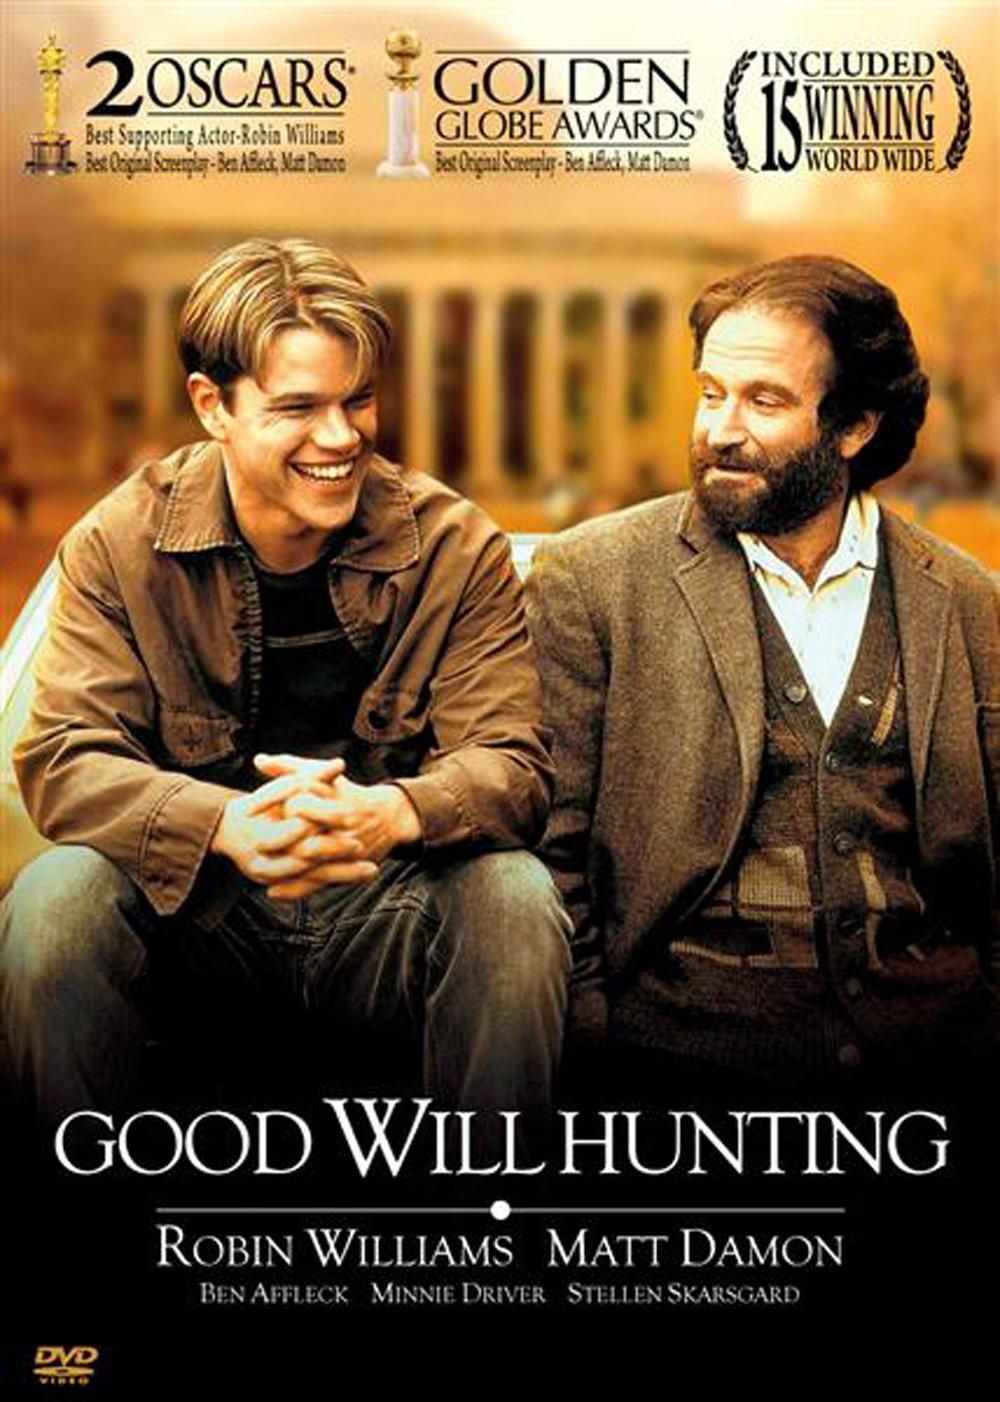 Amazon Com Good Will Hunting 1997 Robin Williams Matt Damon And Ben Affleck Robin Williams Matt Damon Ben Affleck Gus Van Sant Movies Tv